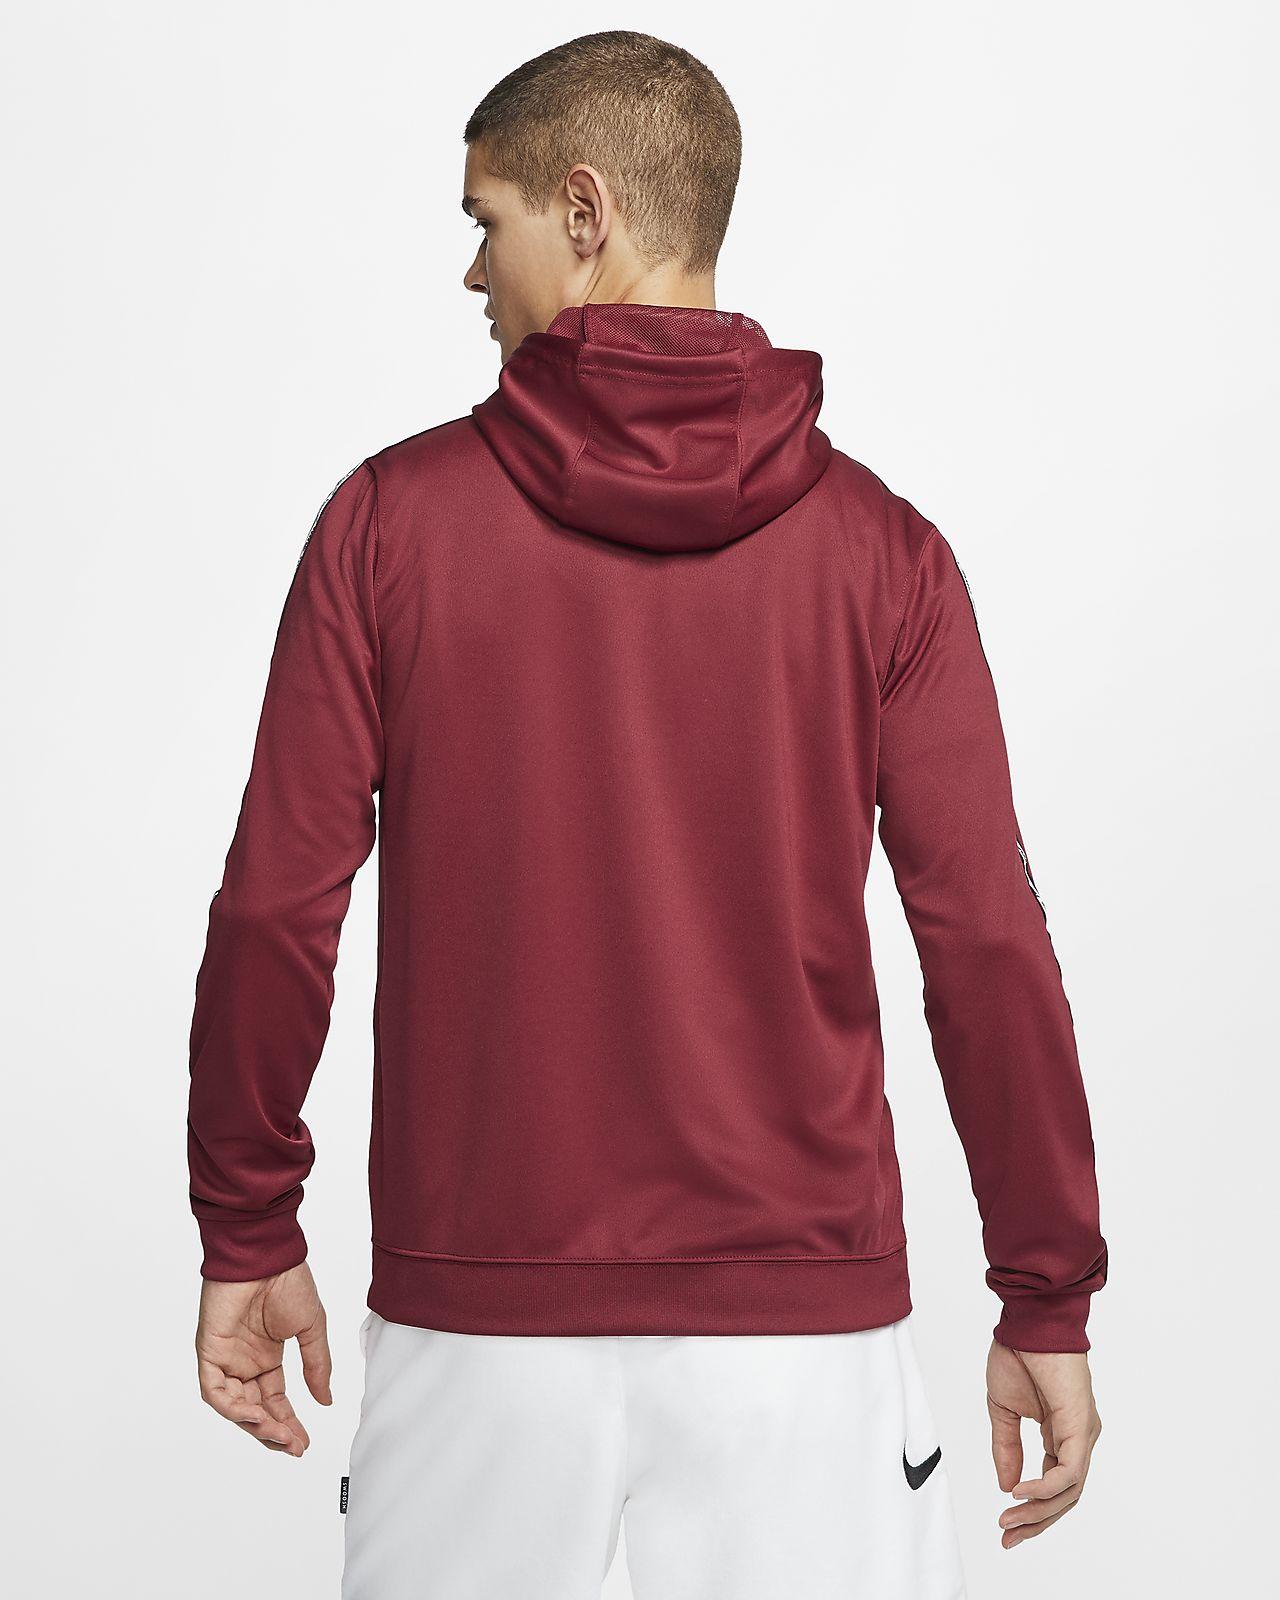 Nike Kapuzenpullover Kapuzenjacke Hoodie Herren Sweatshirt Sport Swoosh L 2XL